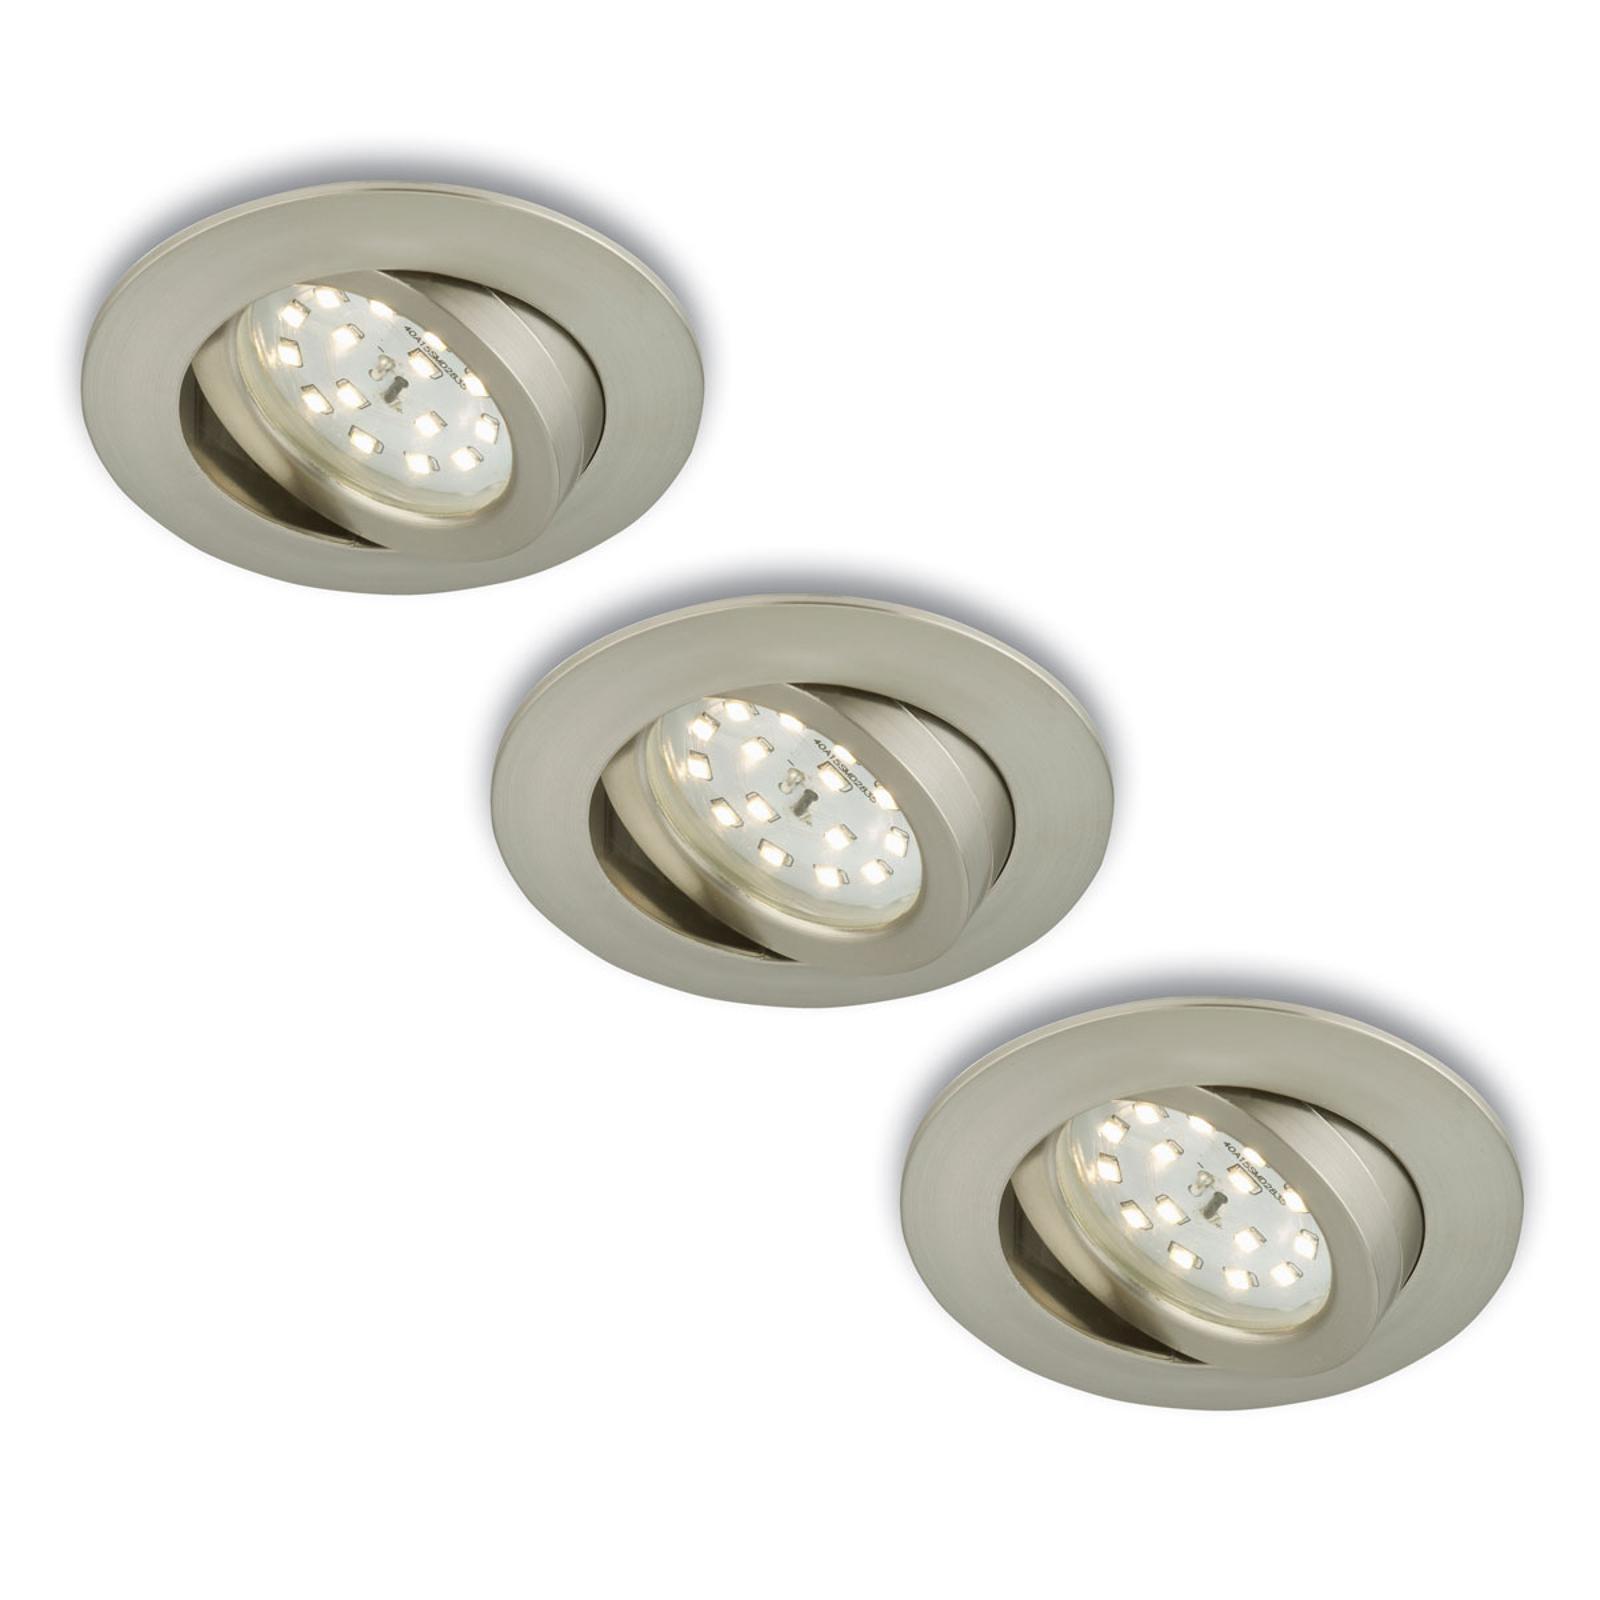 Draaibare LED inbouwspot 3 per set mat-nikkel